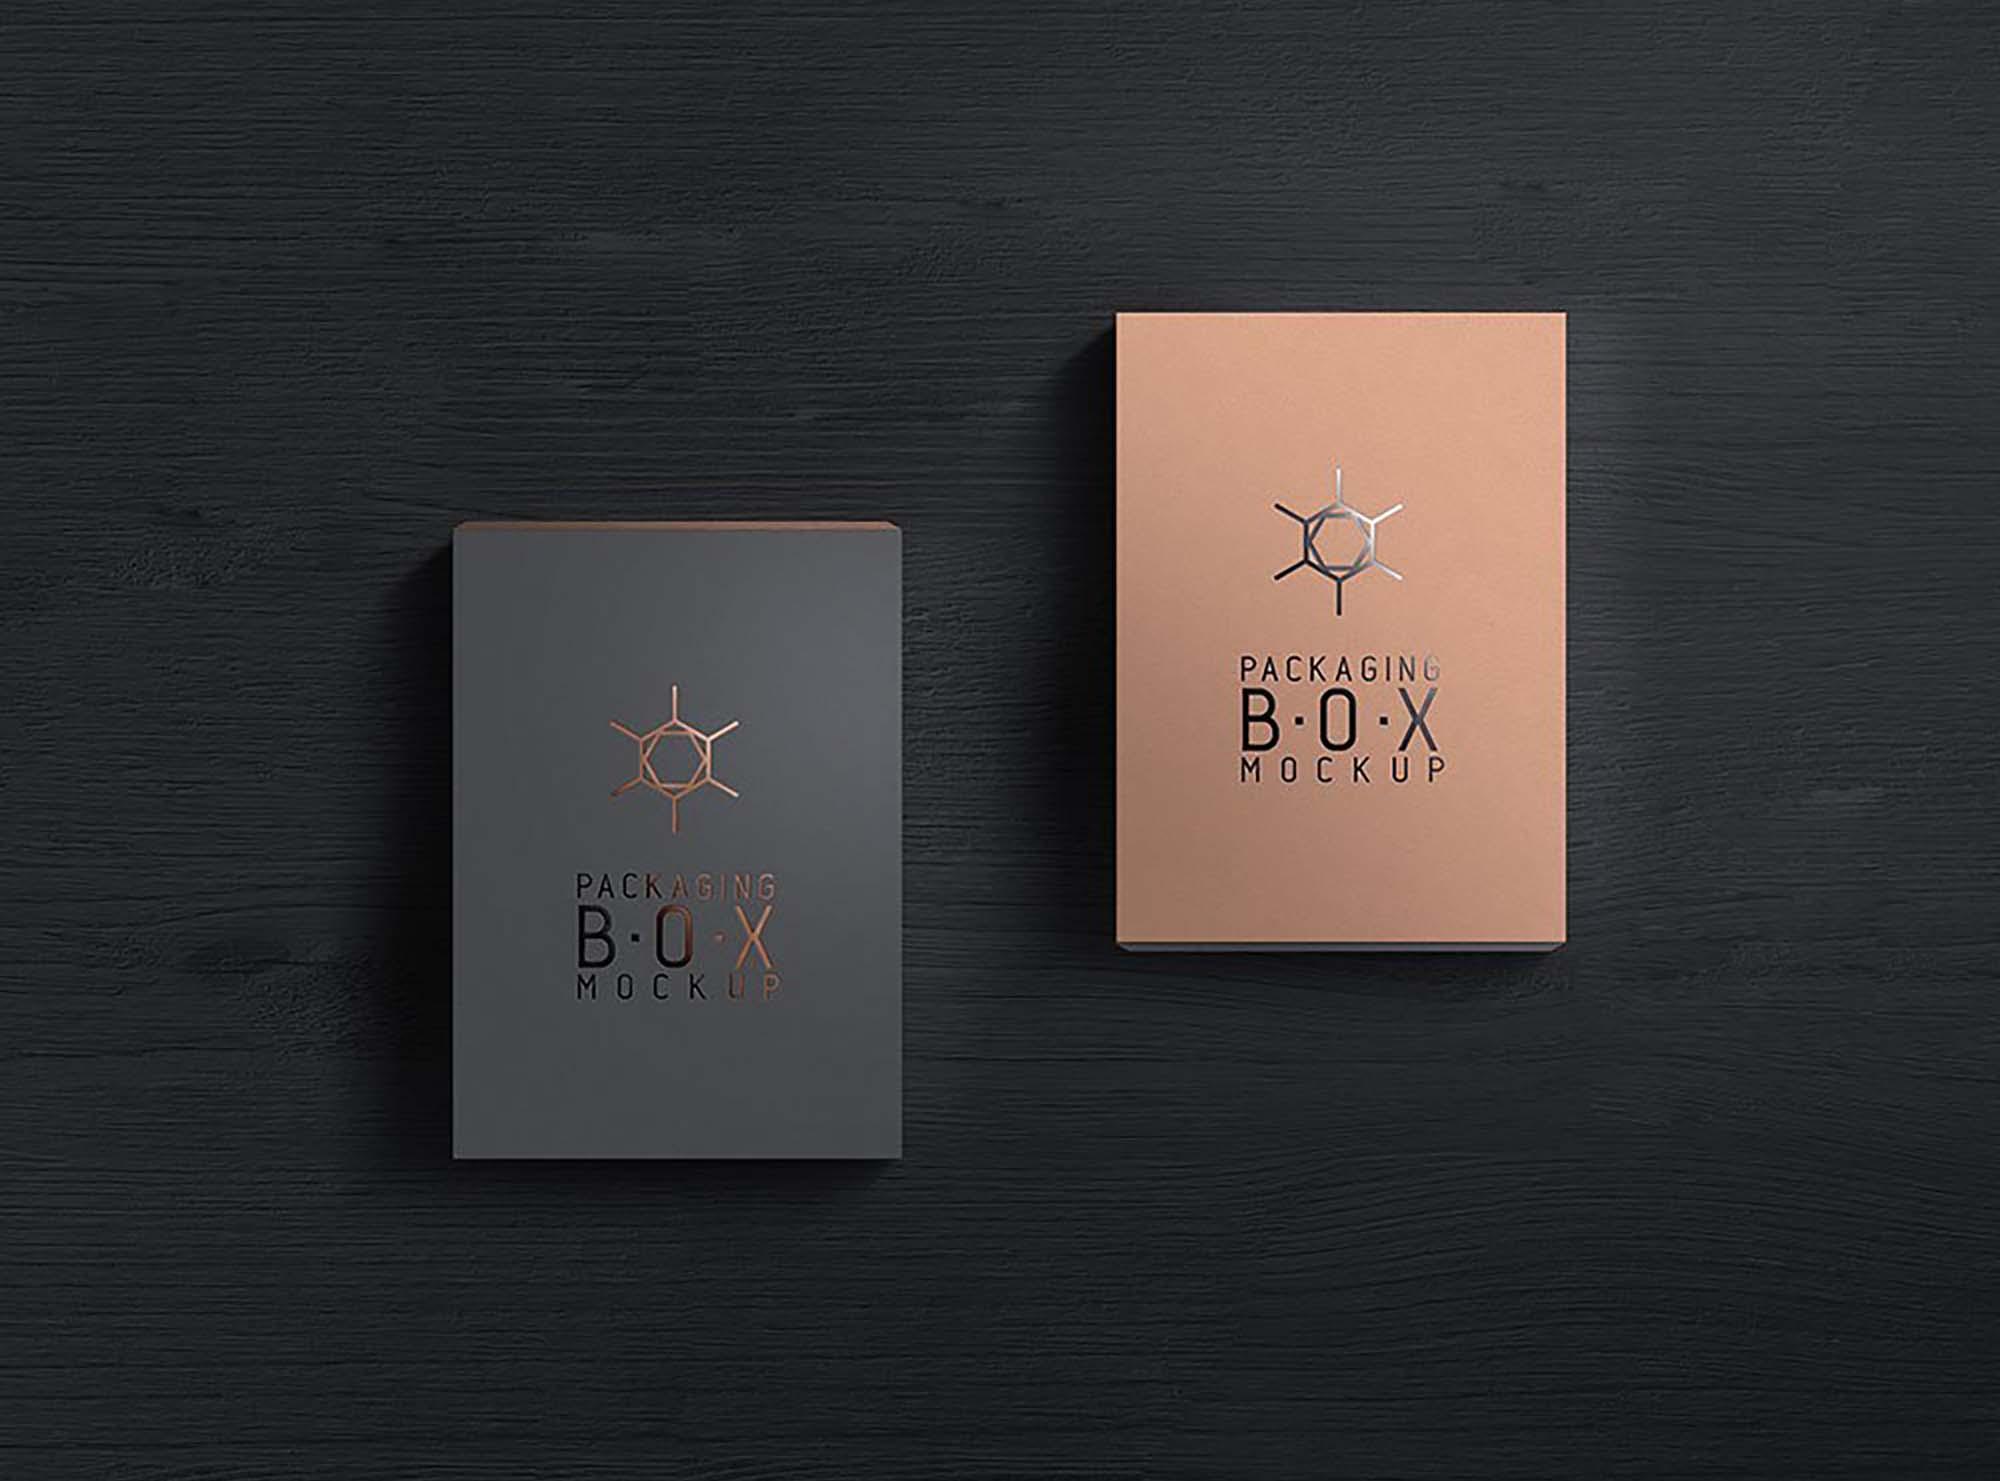 Packaging Product Box Mockup 2